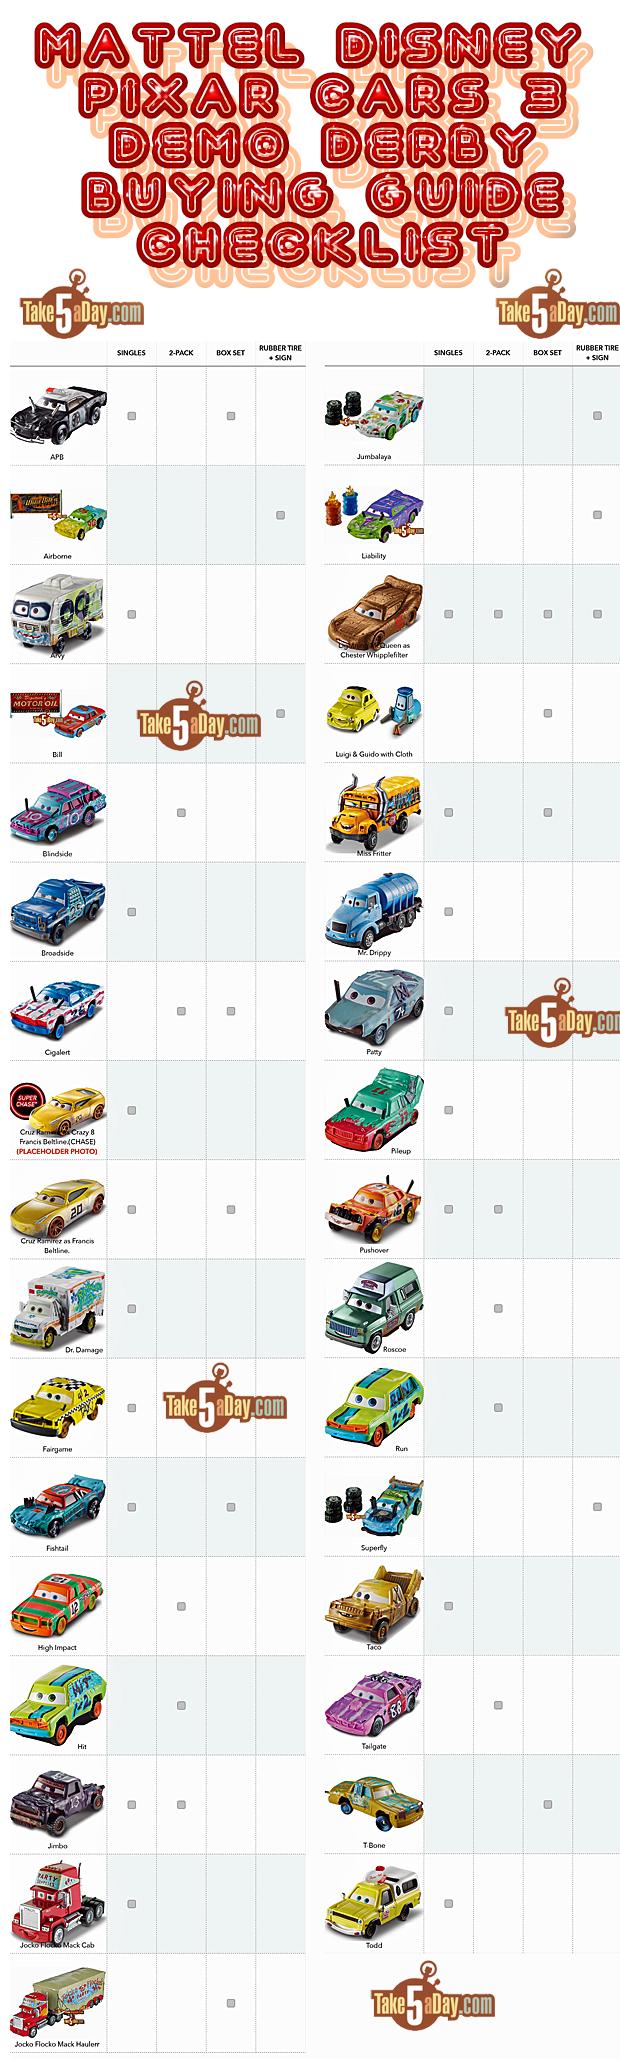 Mattel Disney Pixar CARS 3: Demo Derby Thunder Hollow Diecast ...